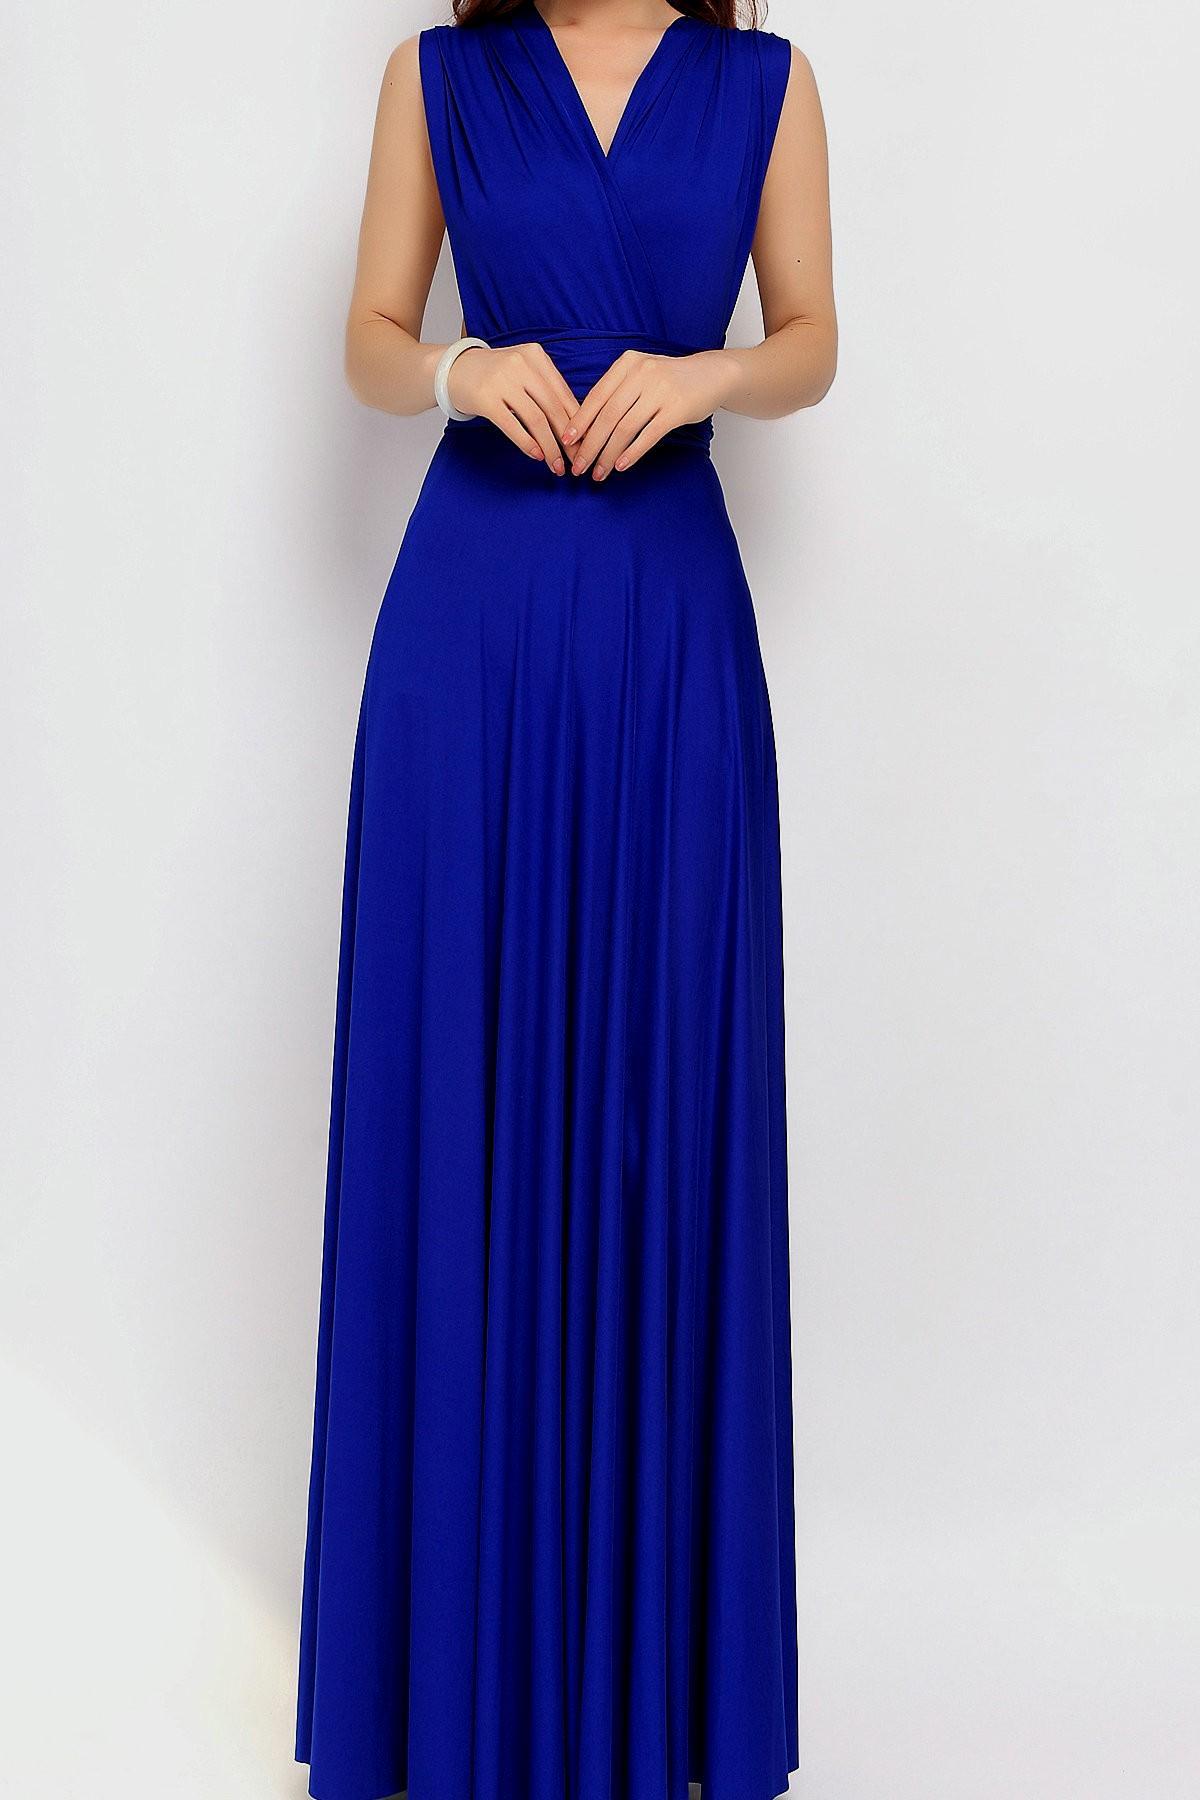 royal blue maxi dress casual photo - 1